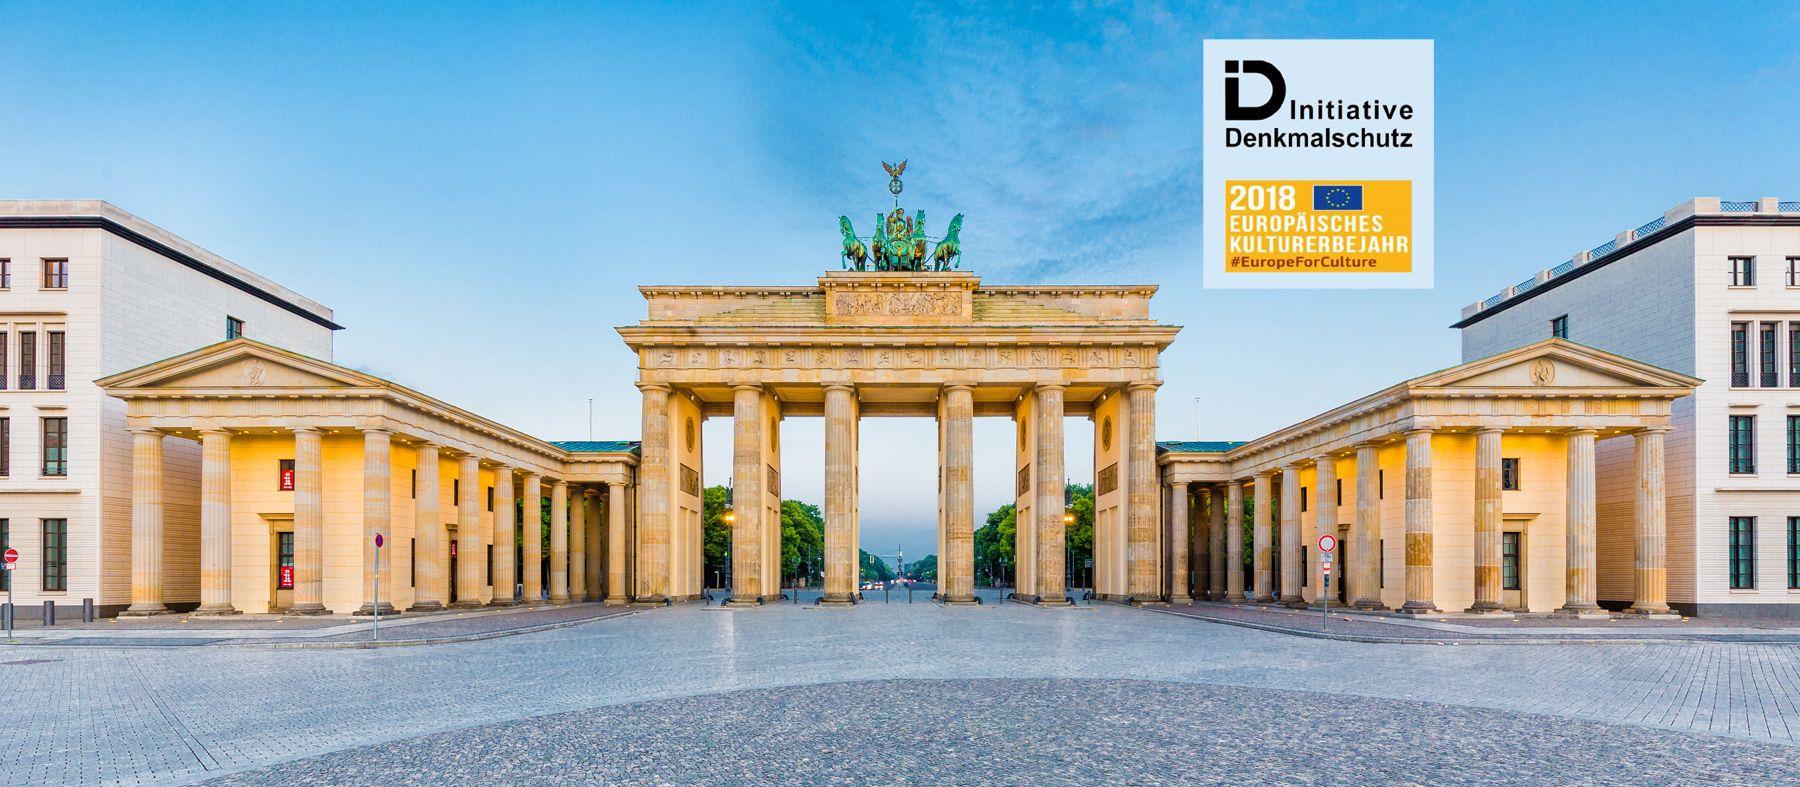 Berlin BrandenburgerTor iStock516331068 inititative Denkmalschutz